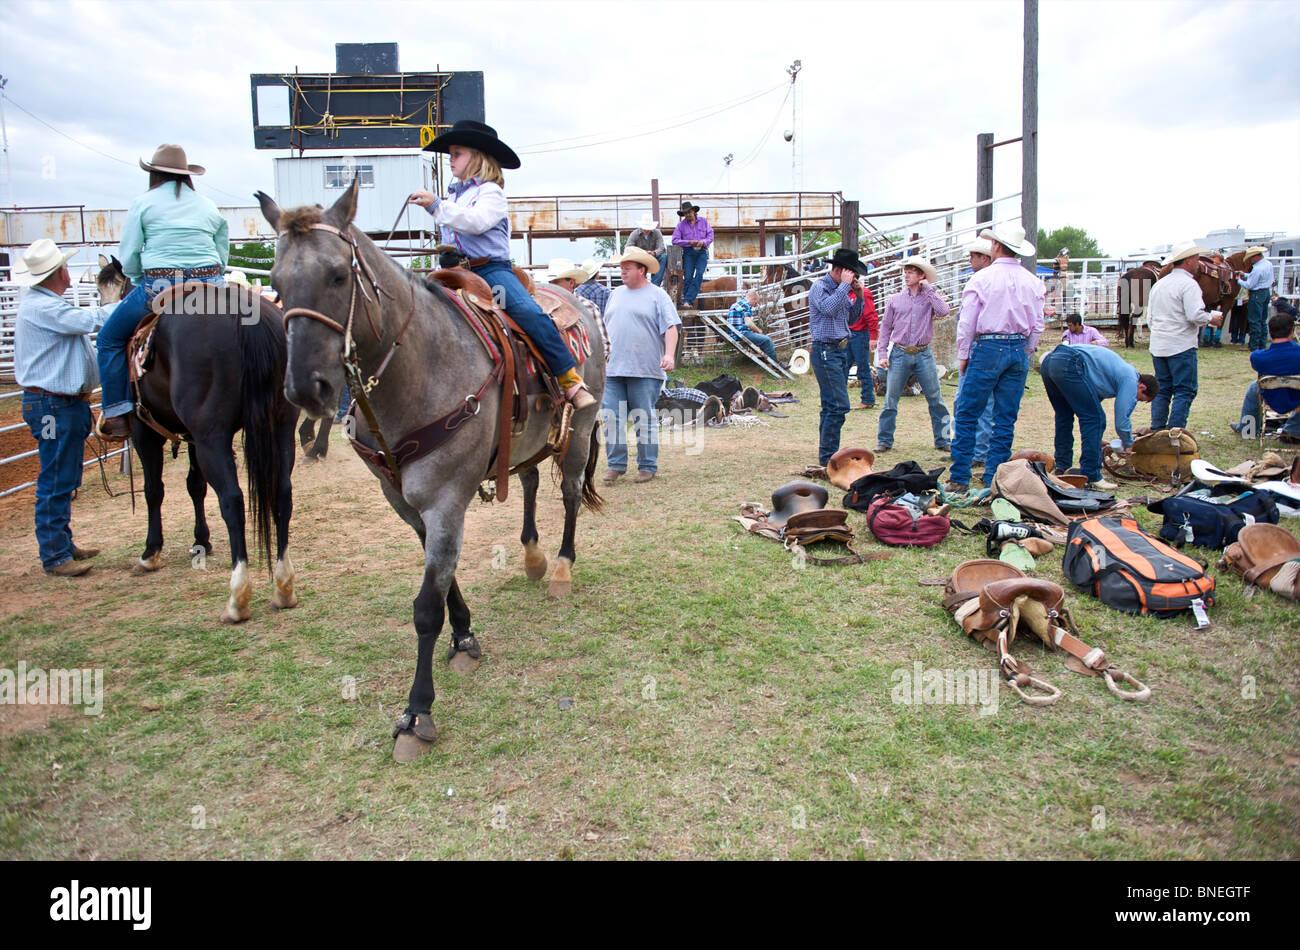 Cowgirl Reiten Pferd backstage bei PRCA Rodeo Event in Smalltown Bridgeport, Texas, USA Stockfoto